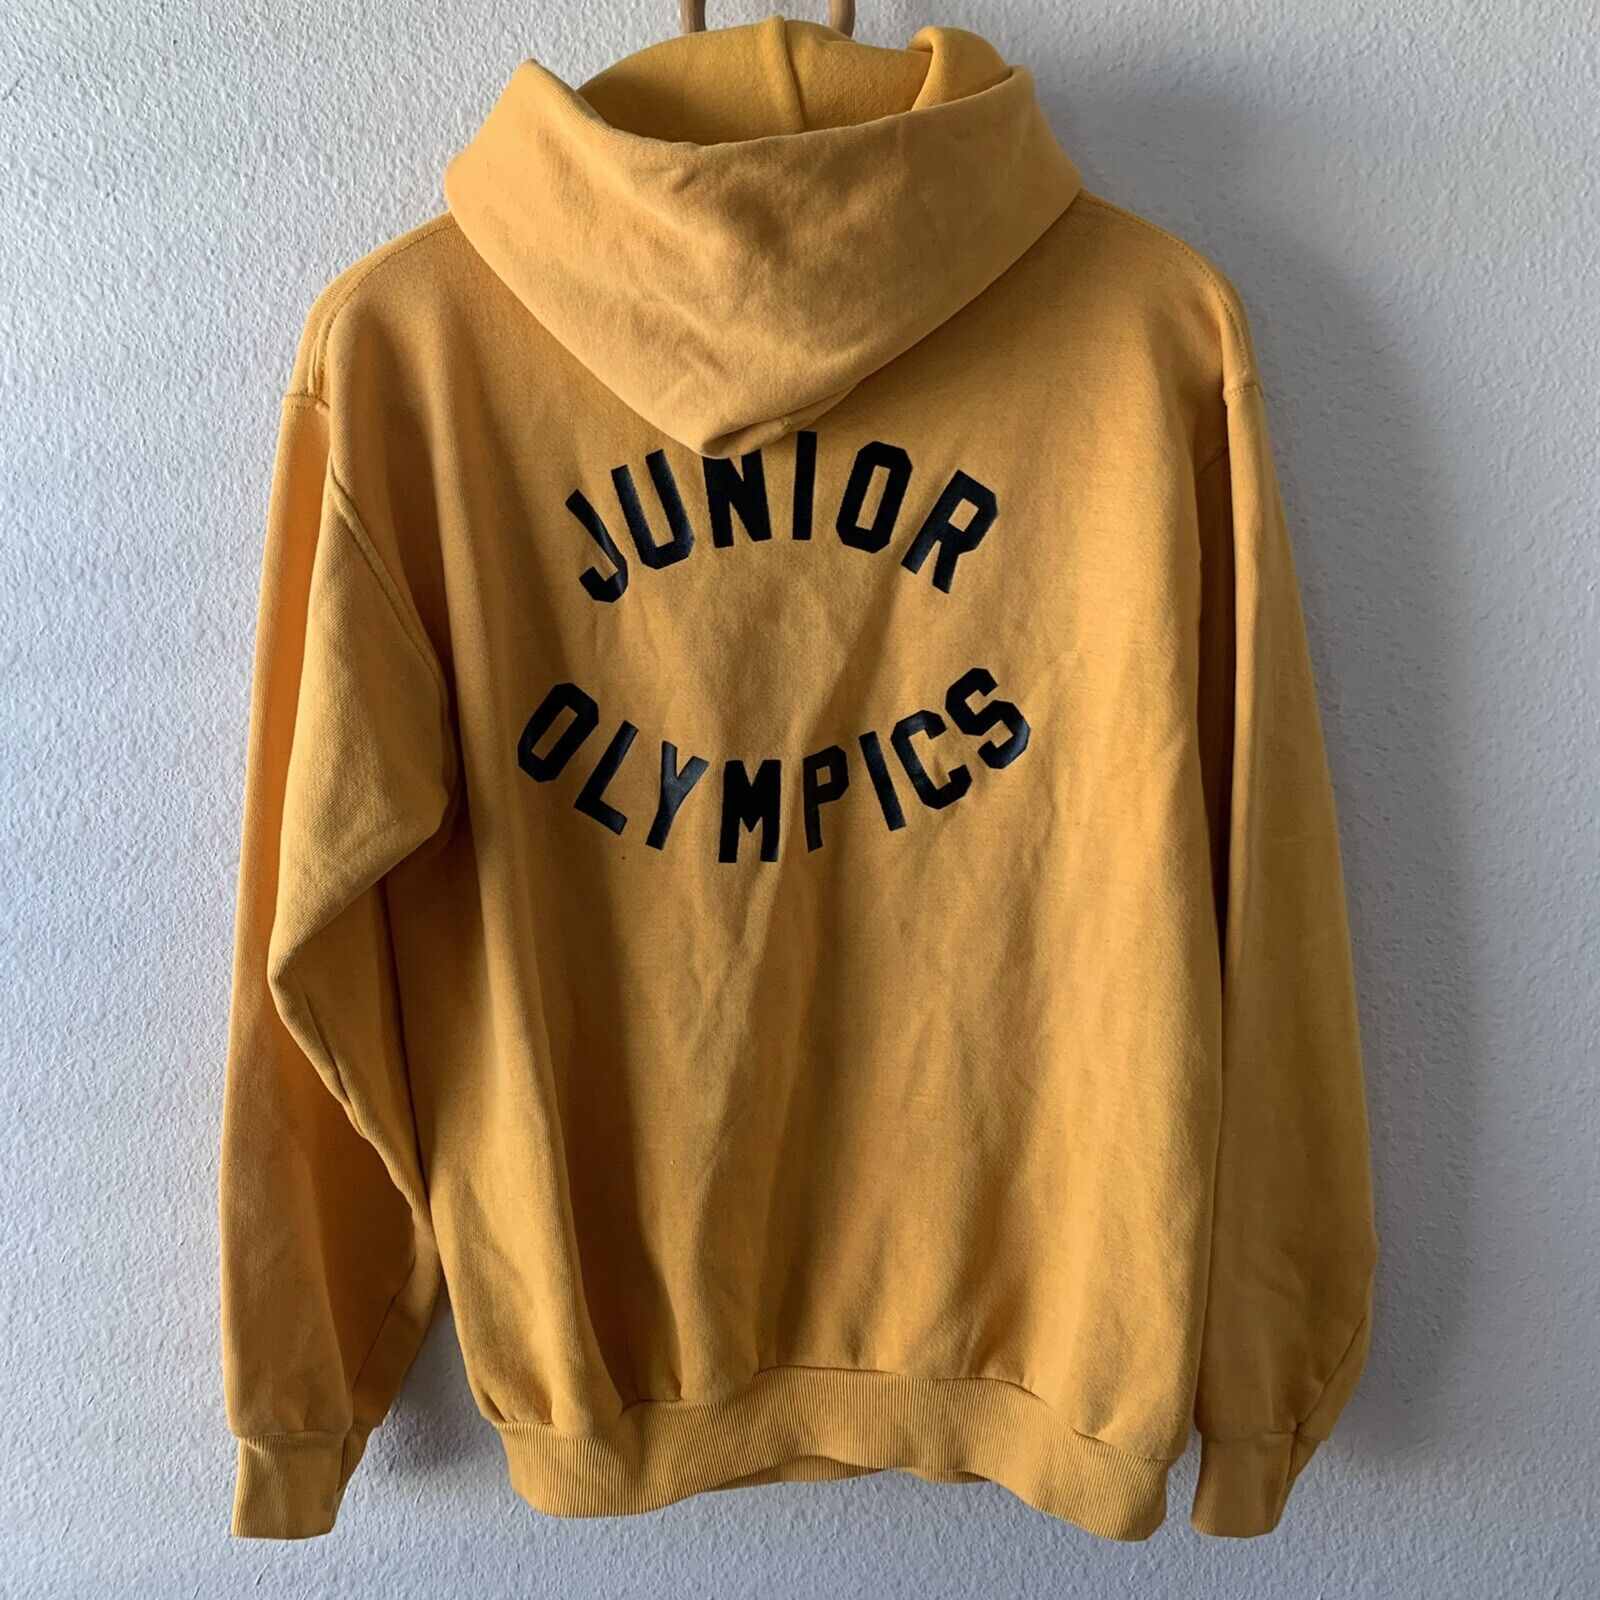 Vintage 70s Hoodie Sweatshirt Junior Olympics Rus… - image 8